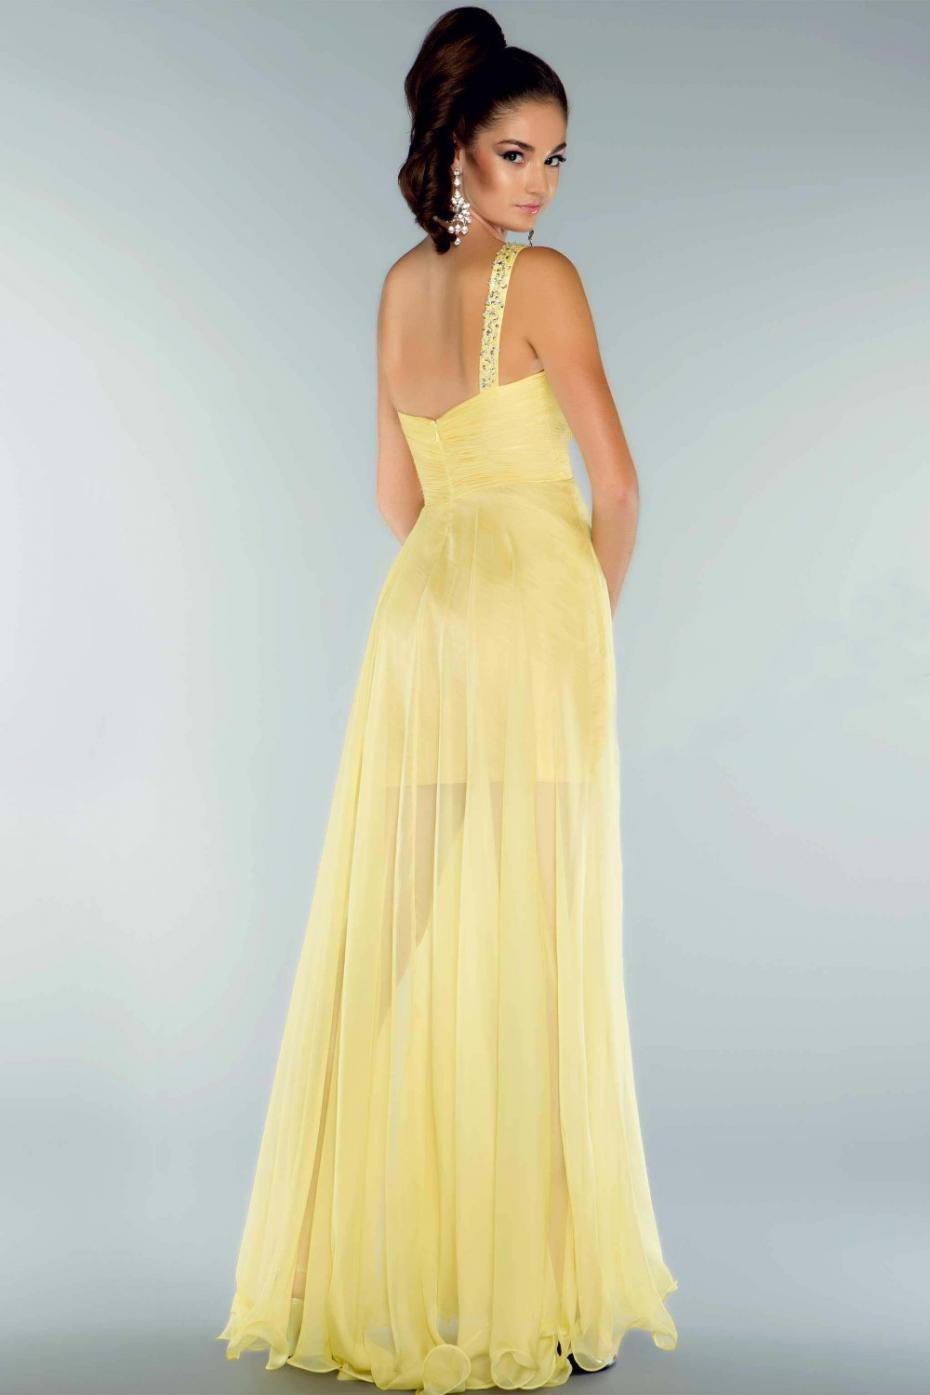 High Low Chiffon Beaded One Shoulder Yellow Short Homecoming Dress ...